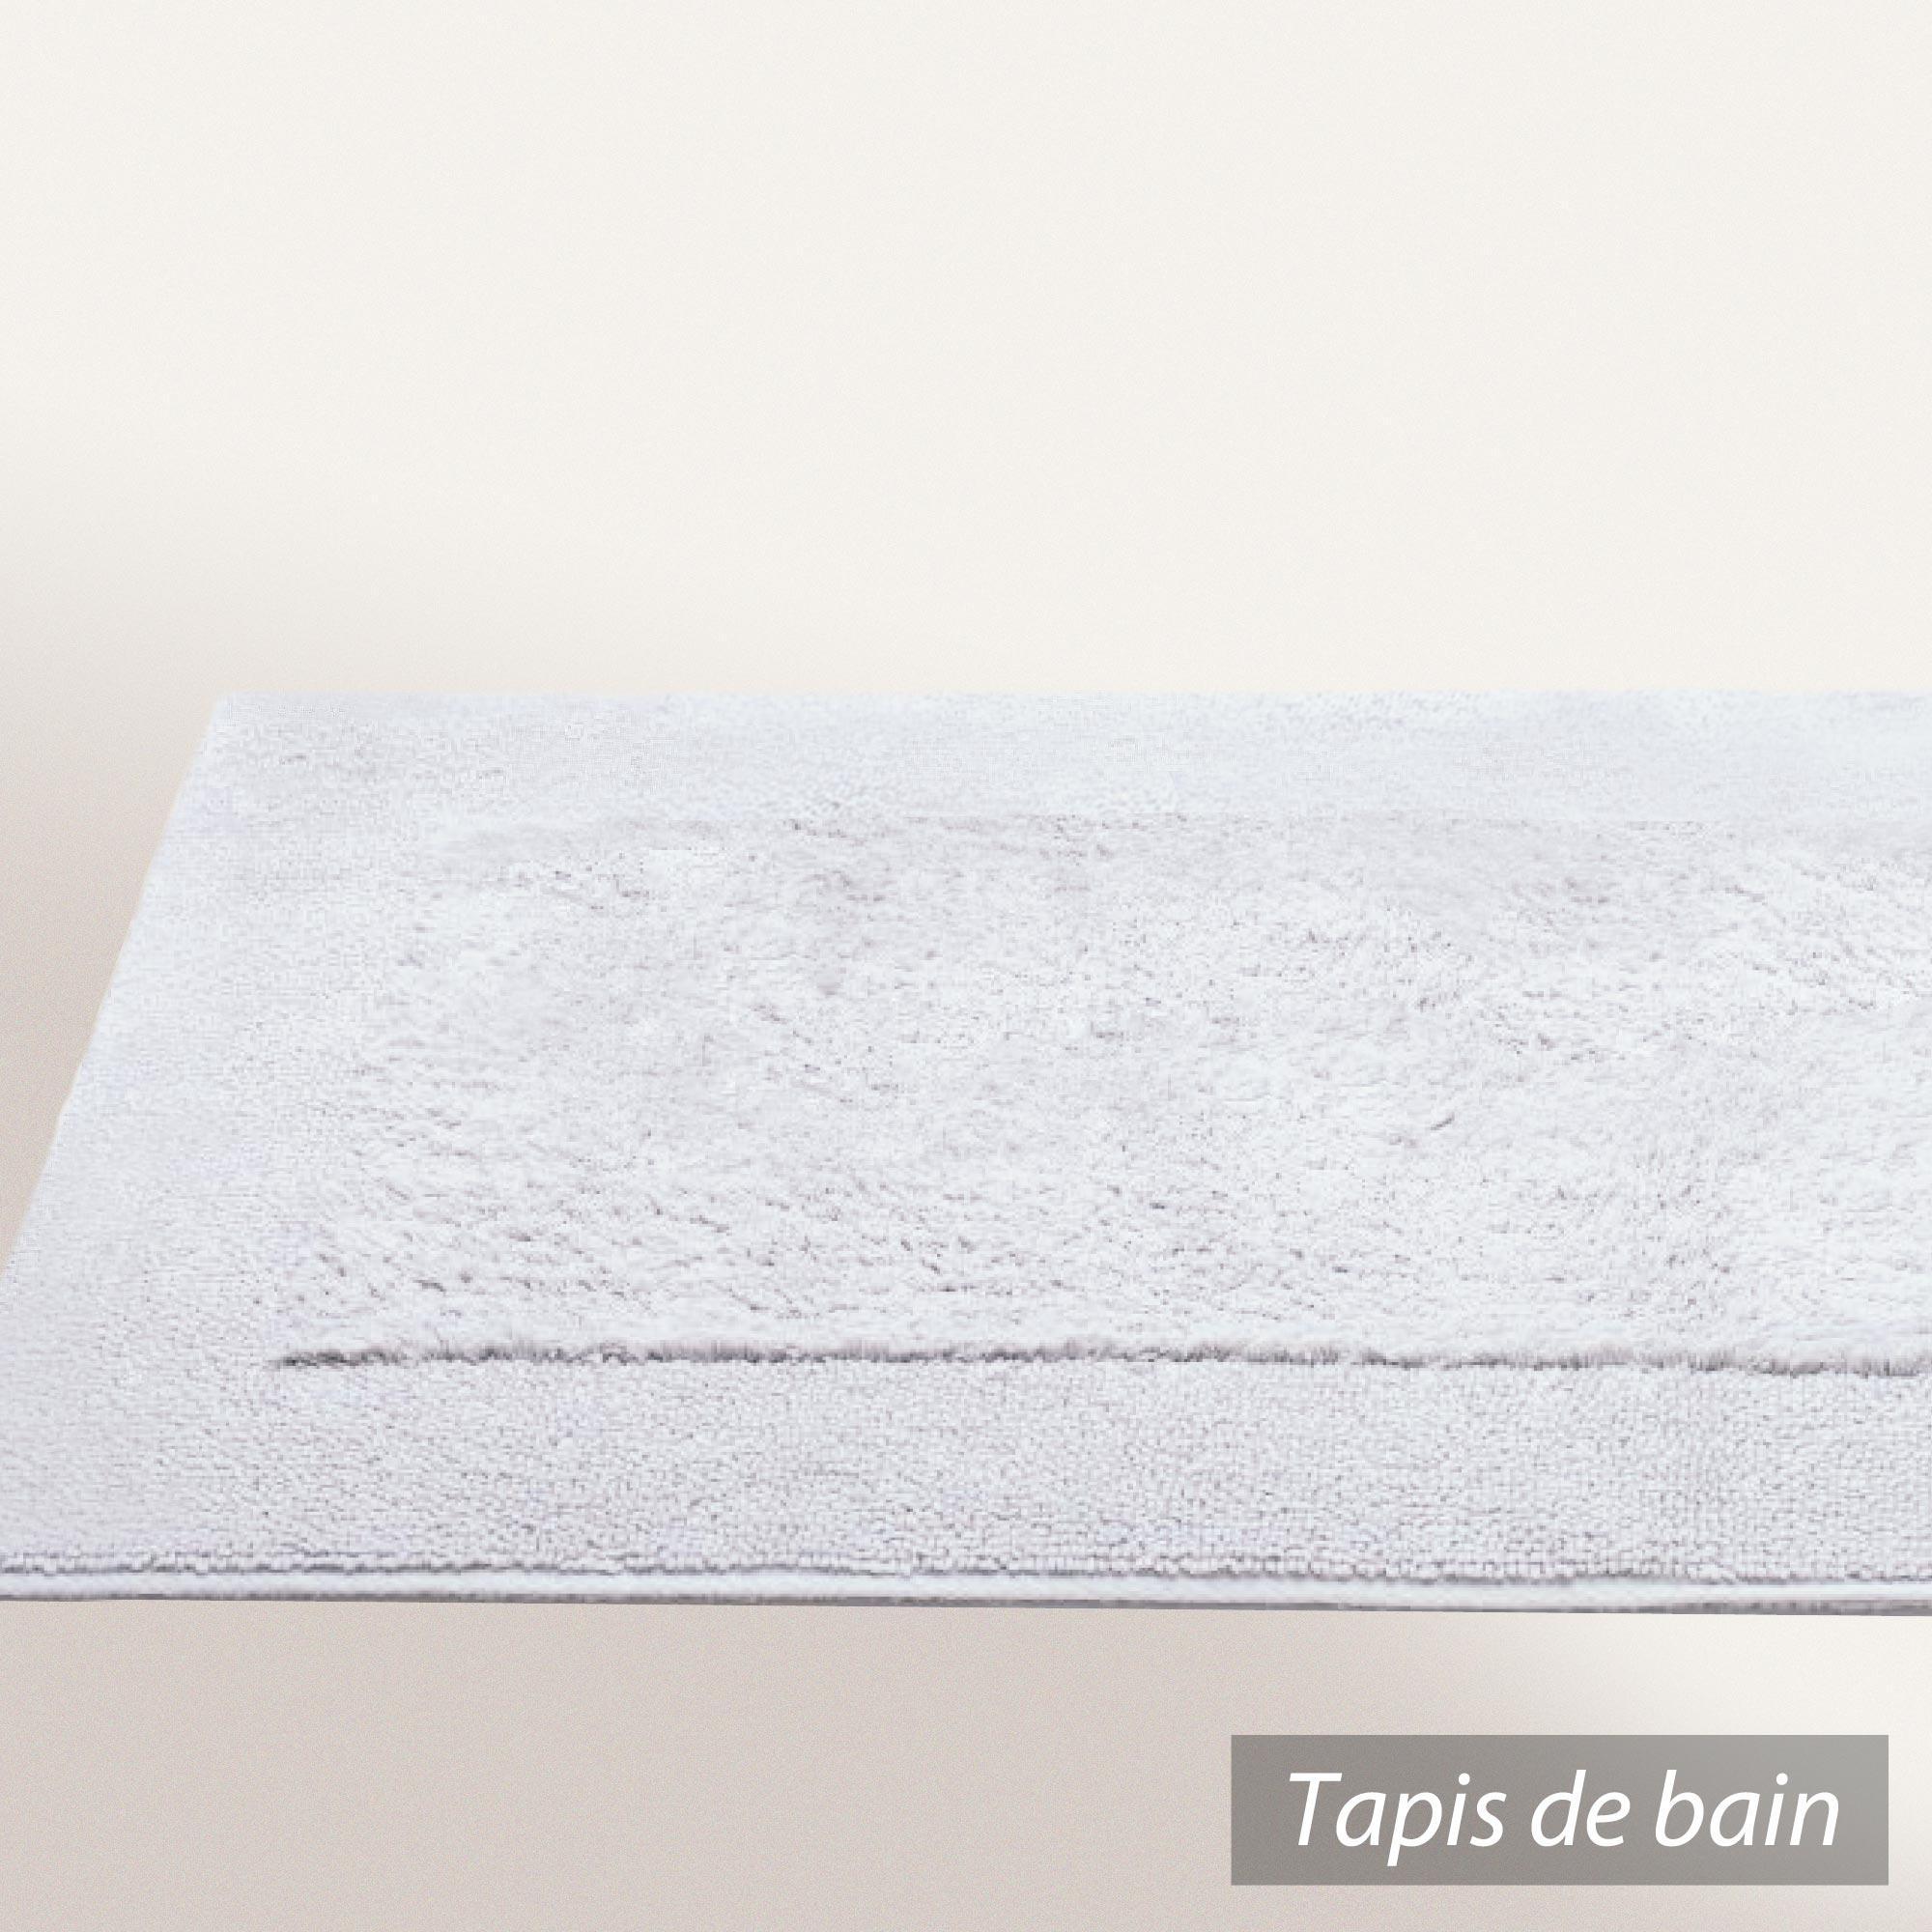 tapis de bain 60x90cm coton uni dream blanc linnea vente. Black Bedroom Furniture Sets. Home Design Ideas